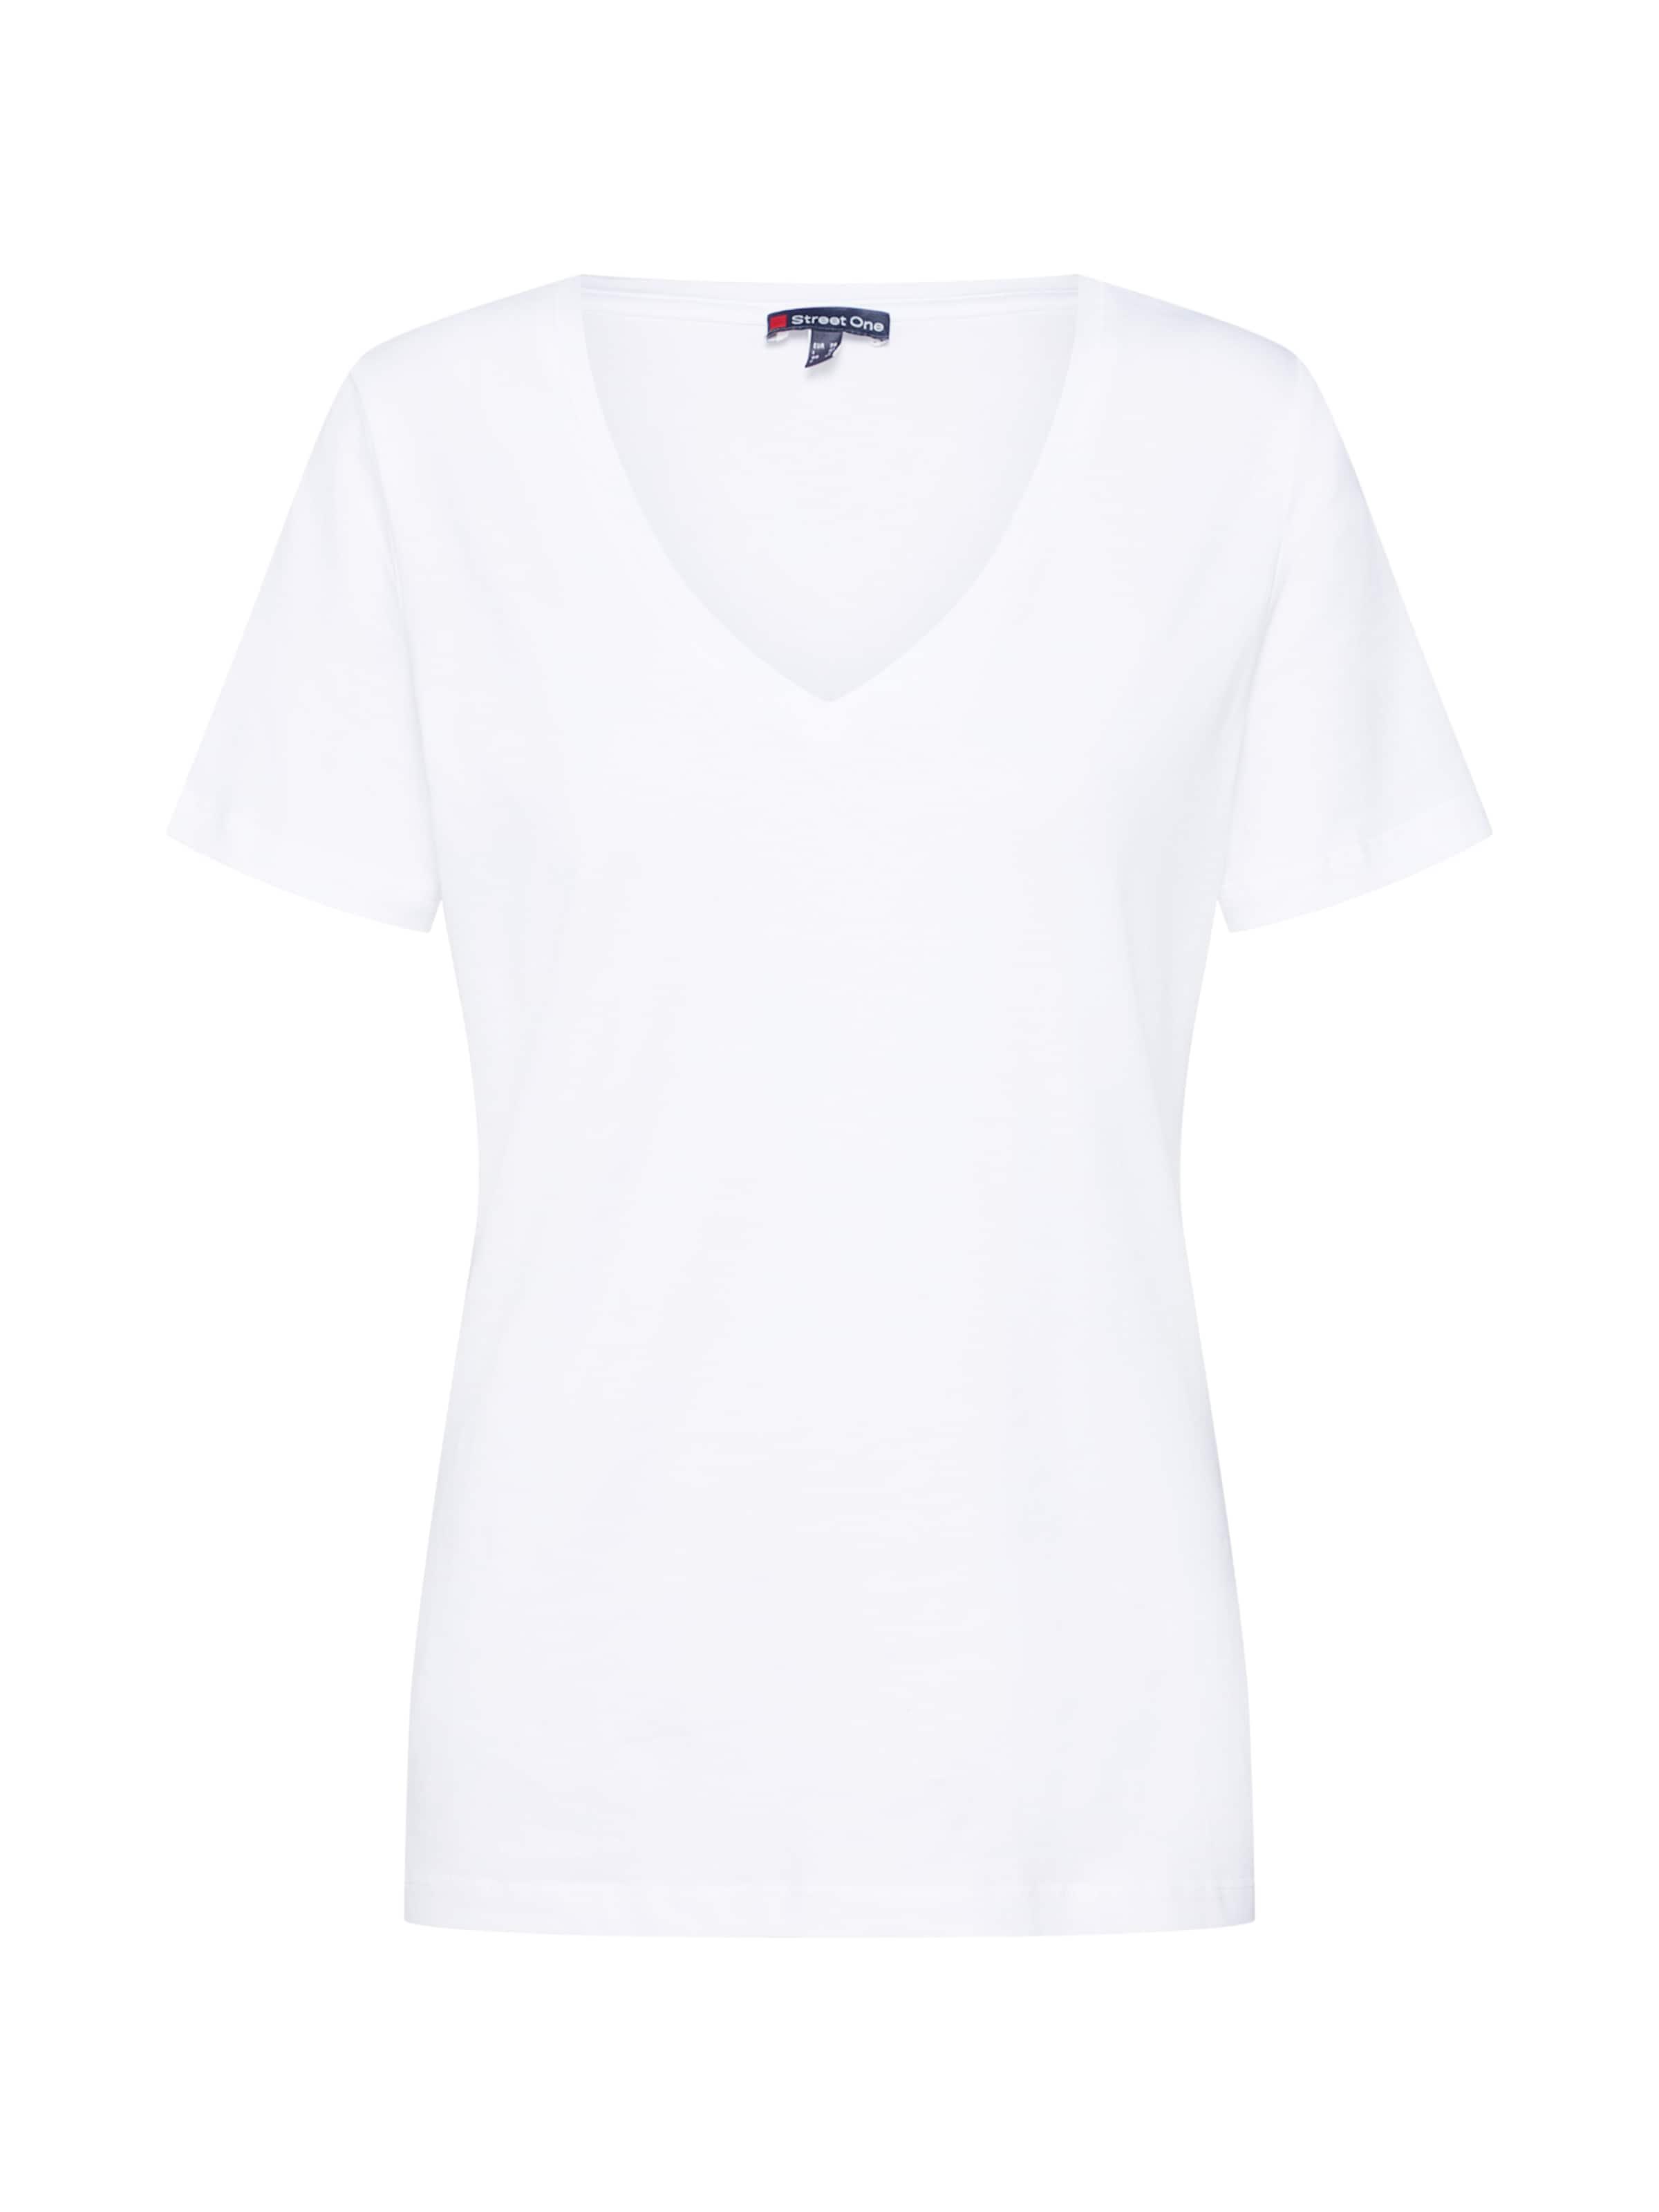 One Shirt Wit 'qr Rhea' Street In 5jL3A4Rq